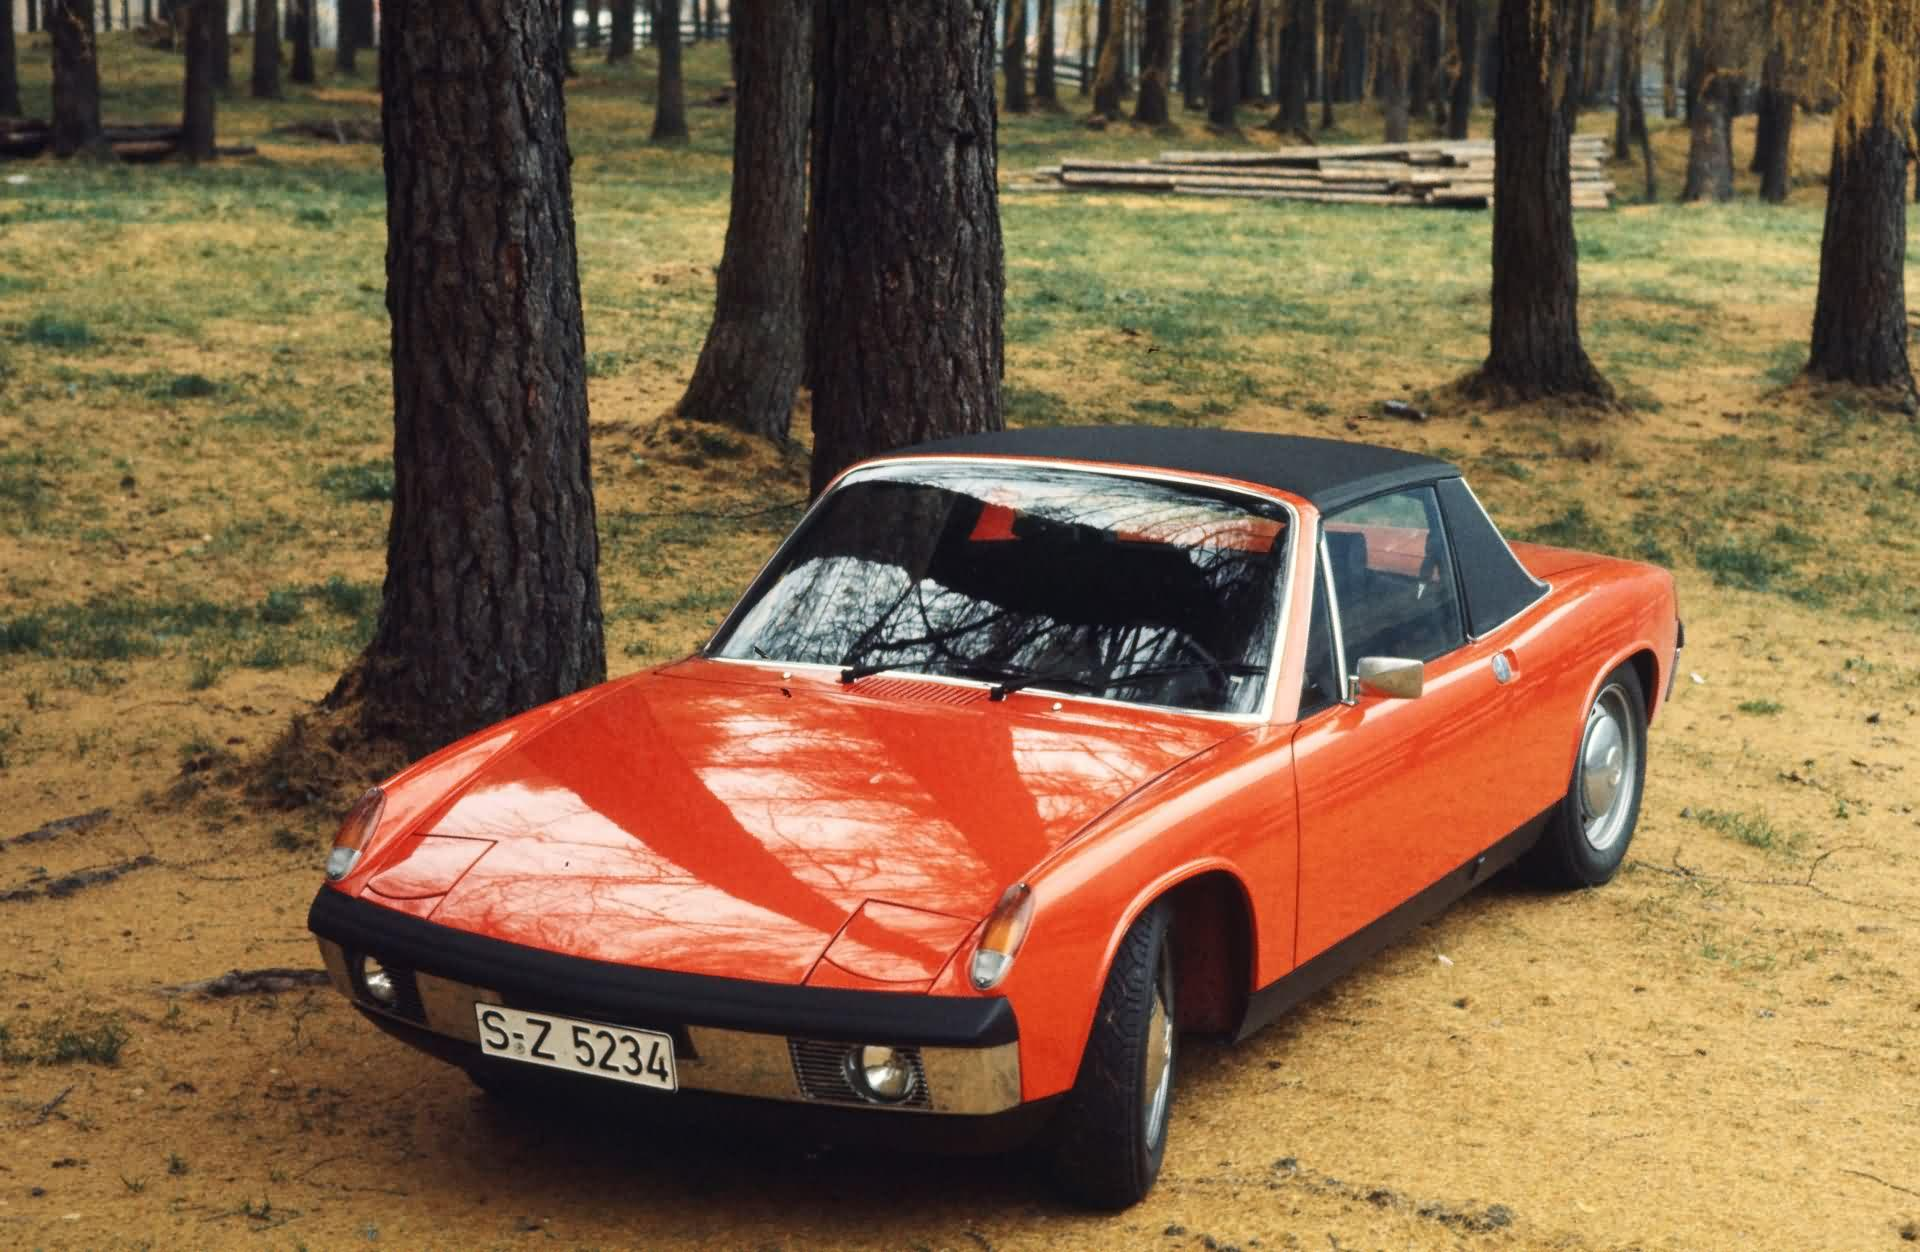 VW Porsche 914 1.7 (1969)